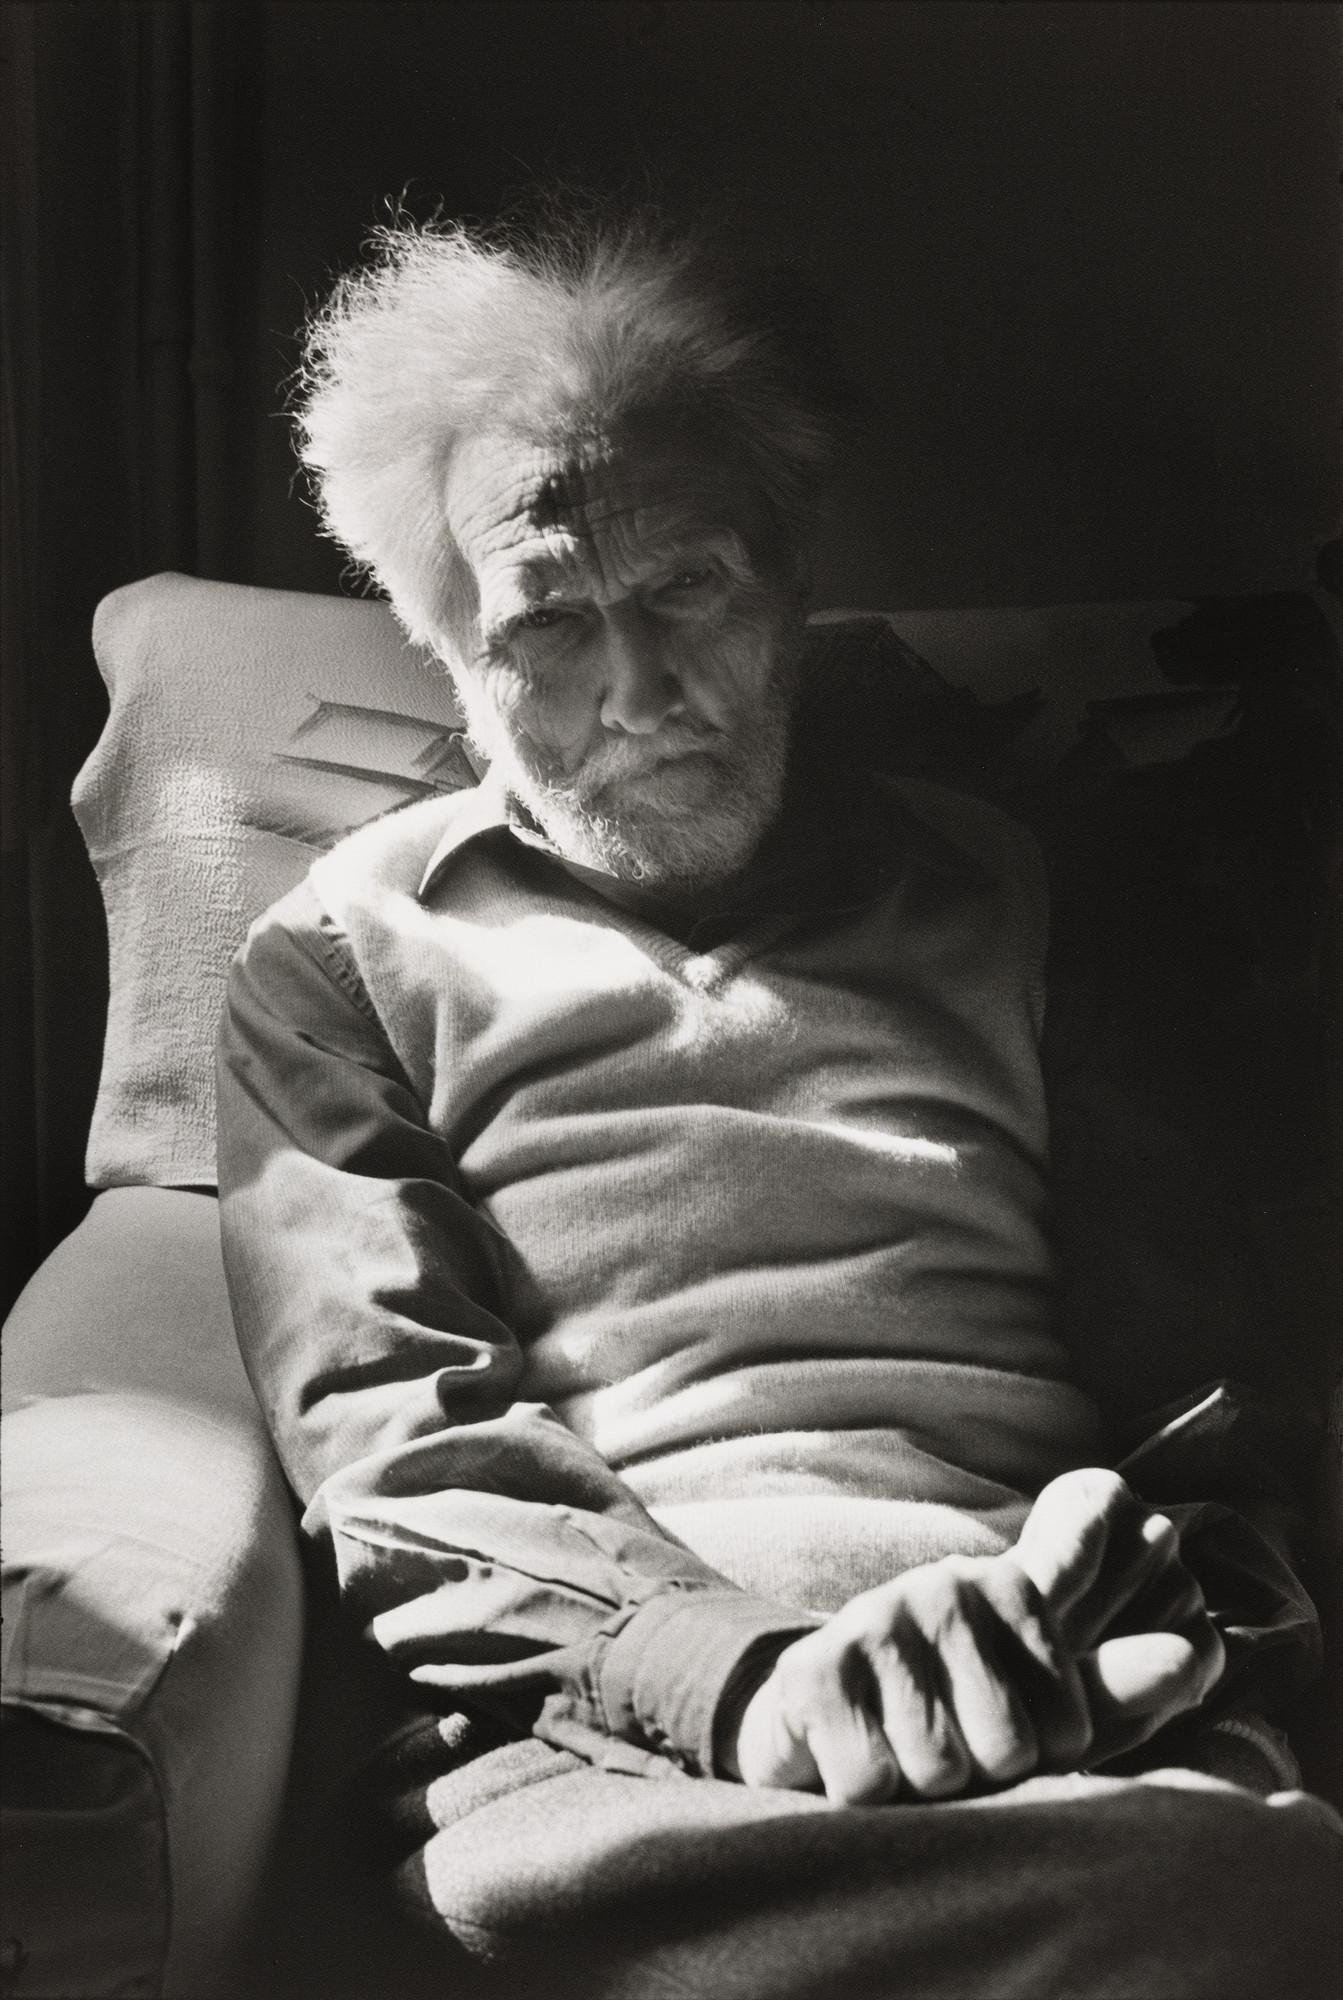 Henri Cartier-Bresson. Ezra Pound, Venice. 1971 | MoMA